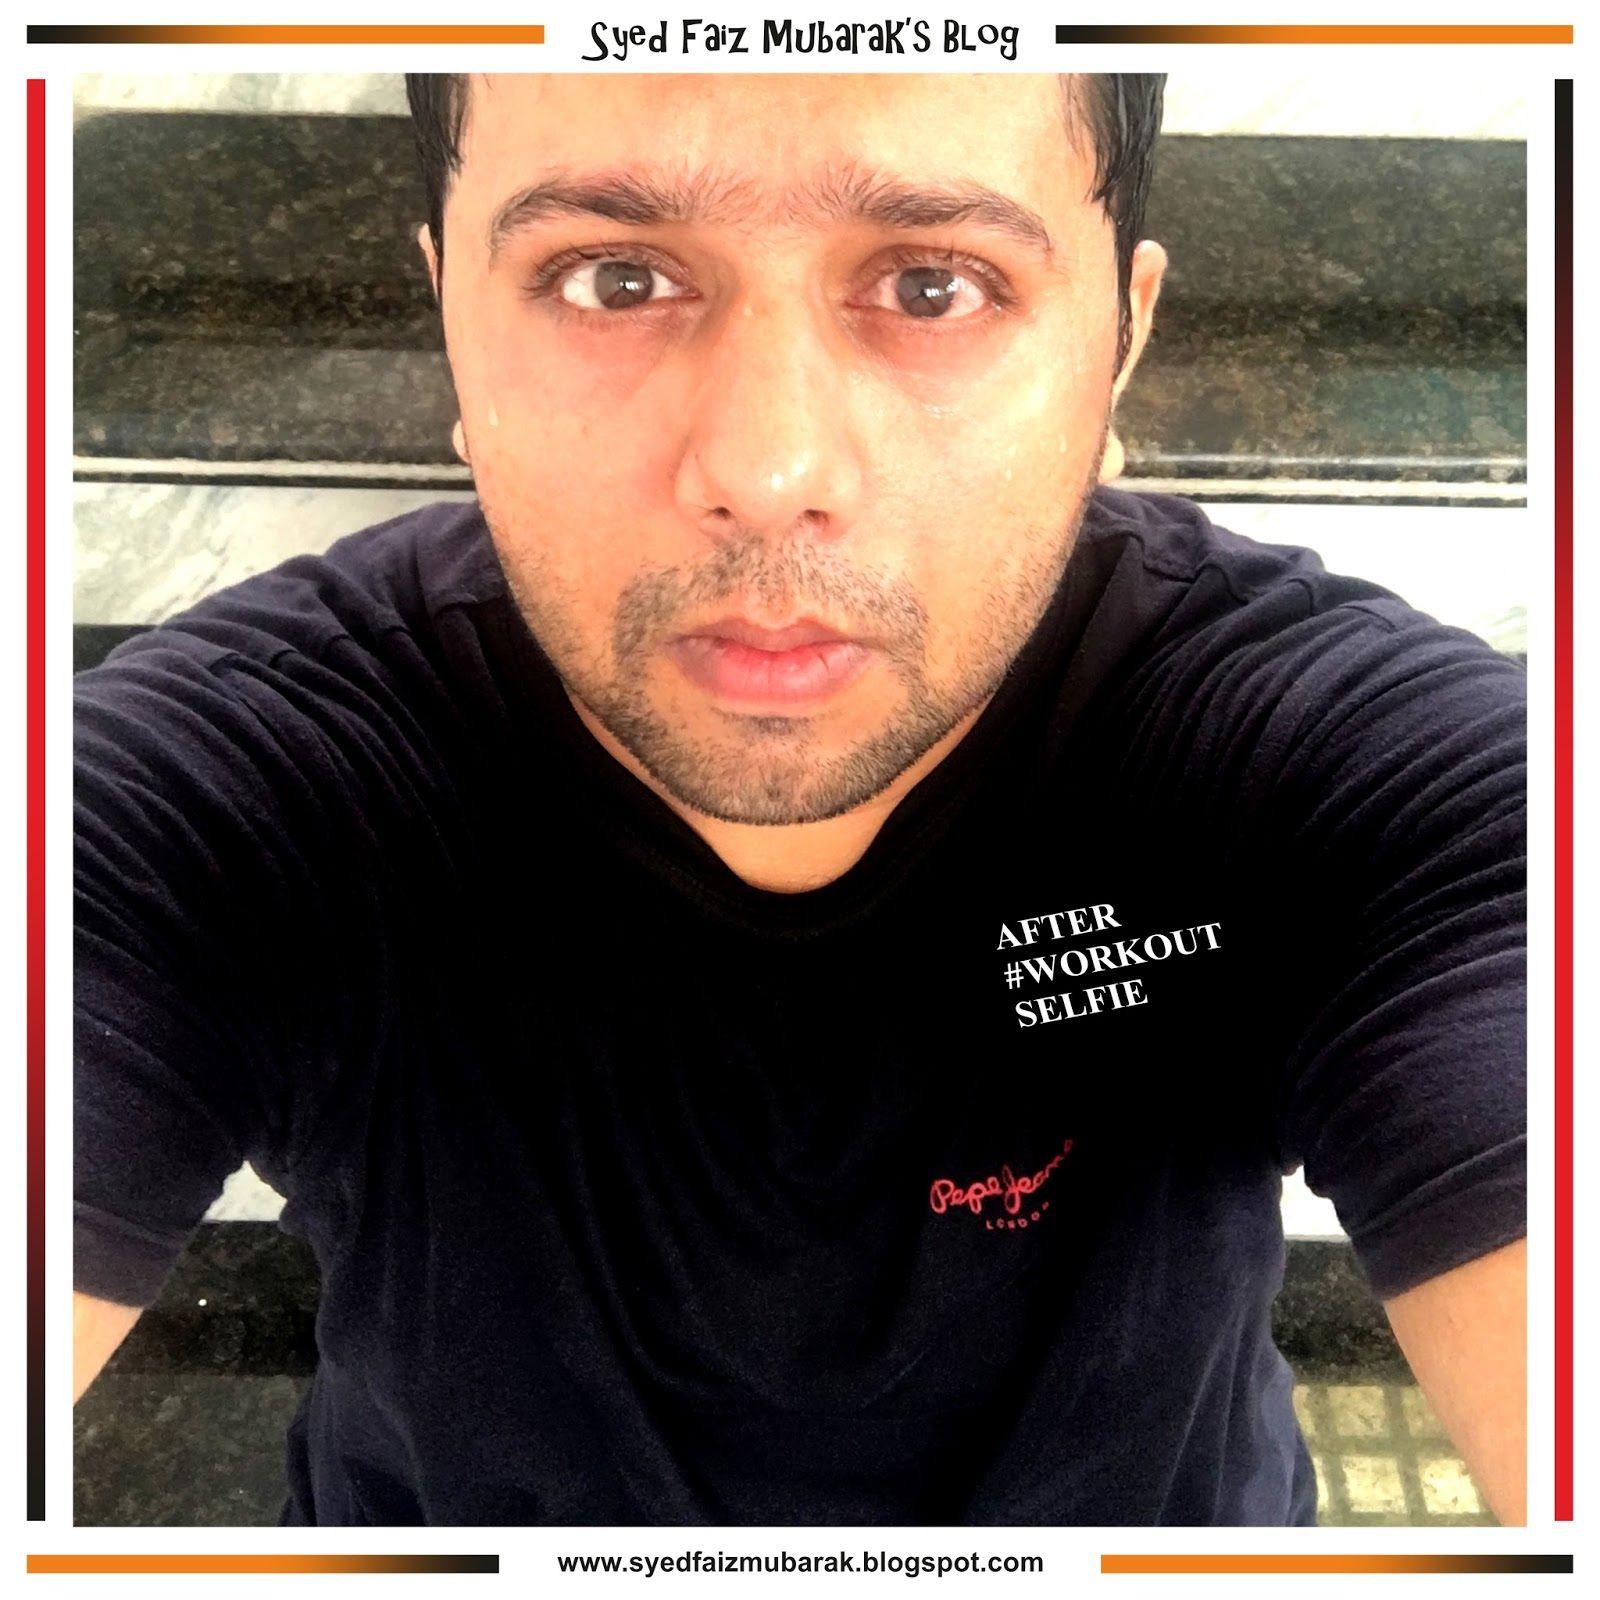 After workout selfie syedfaizmubarak mens tshirts